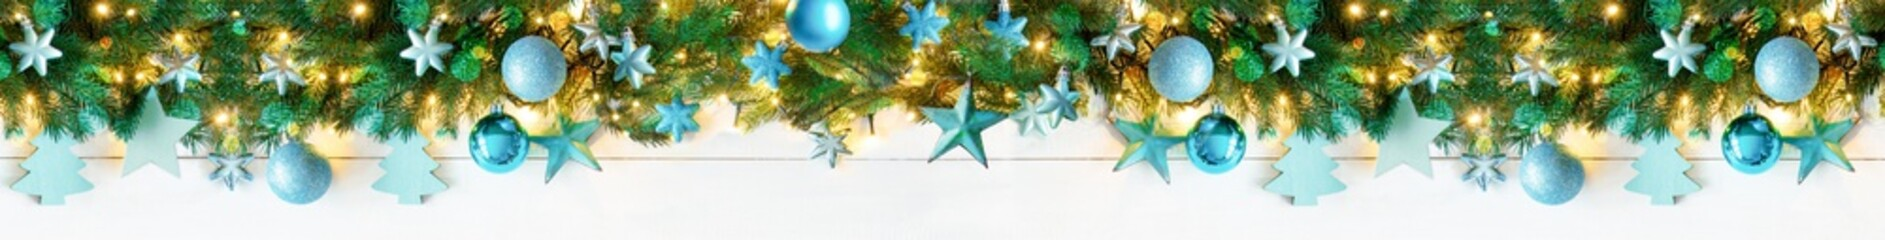 Panorama Turquoise Christmas Banner With Bokeh